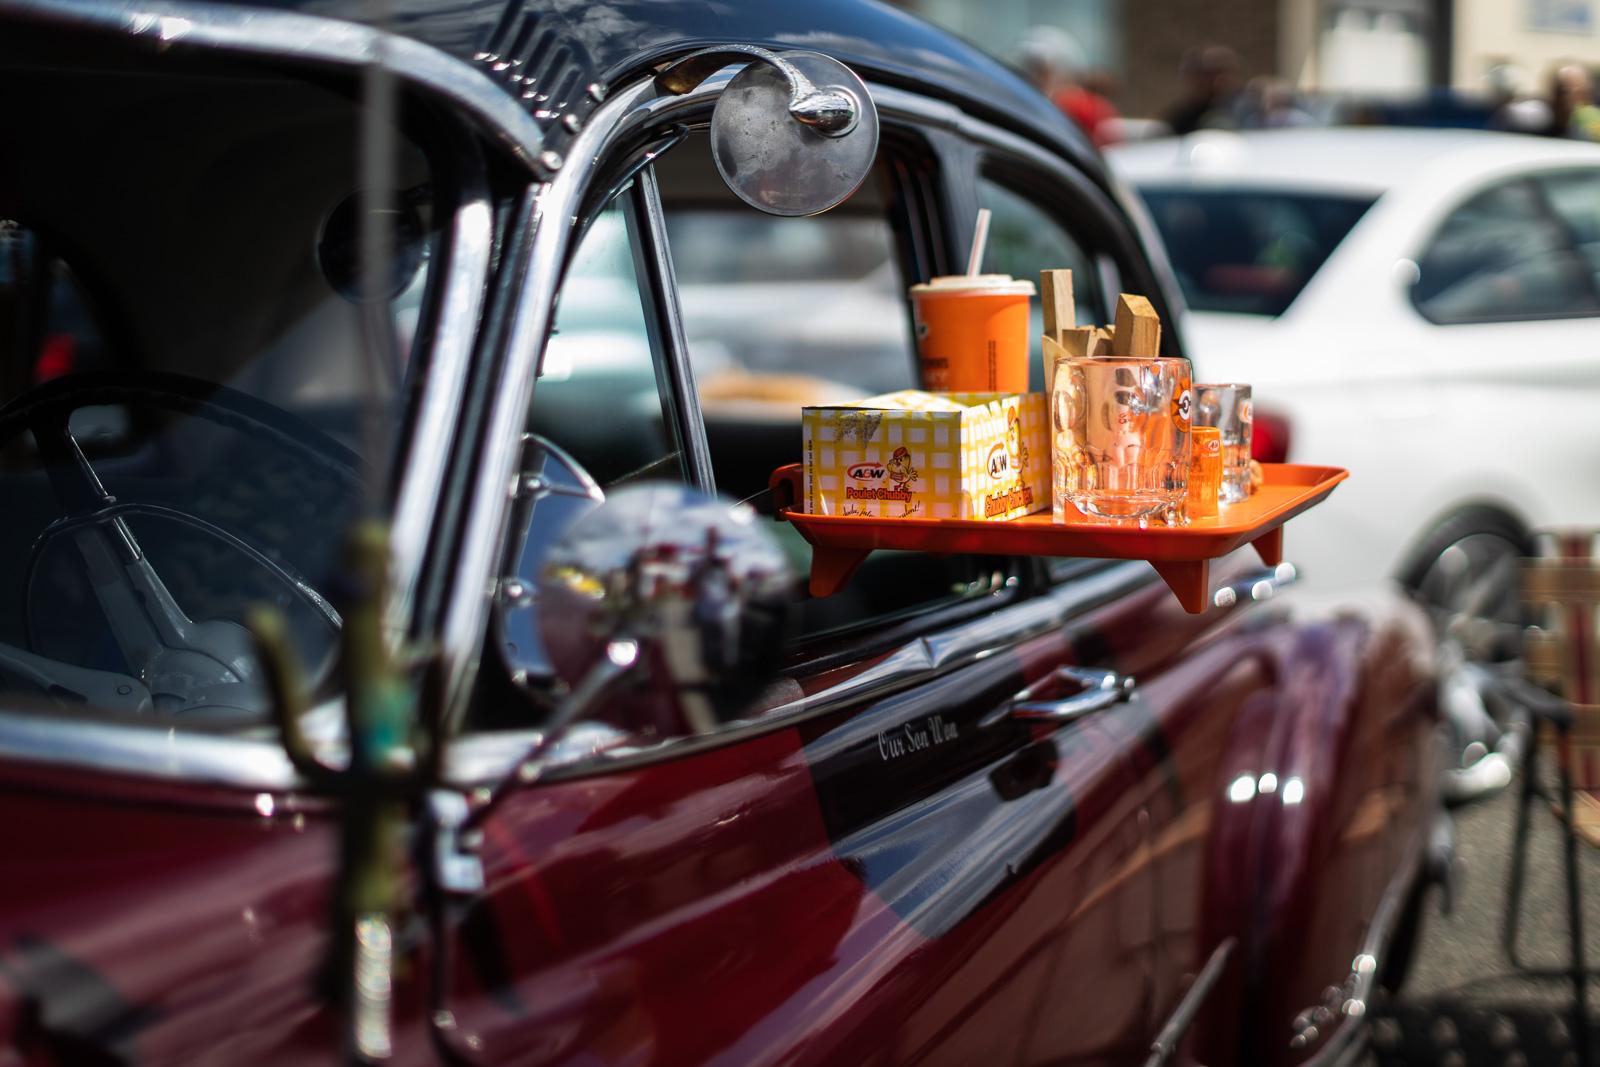 fat-guys-car-show-blog-22.jpg